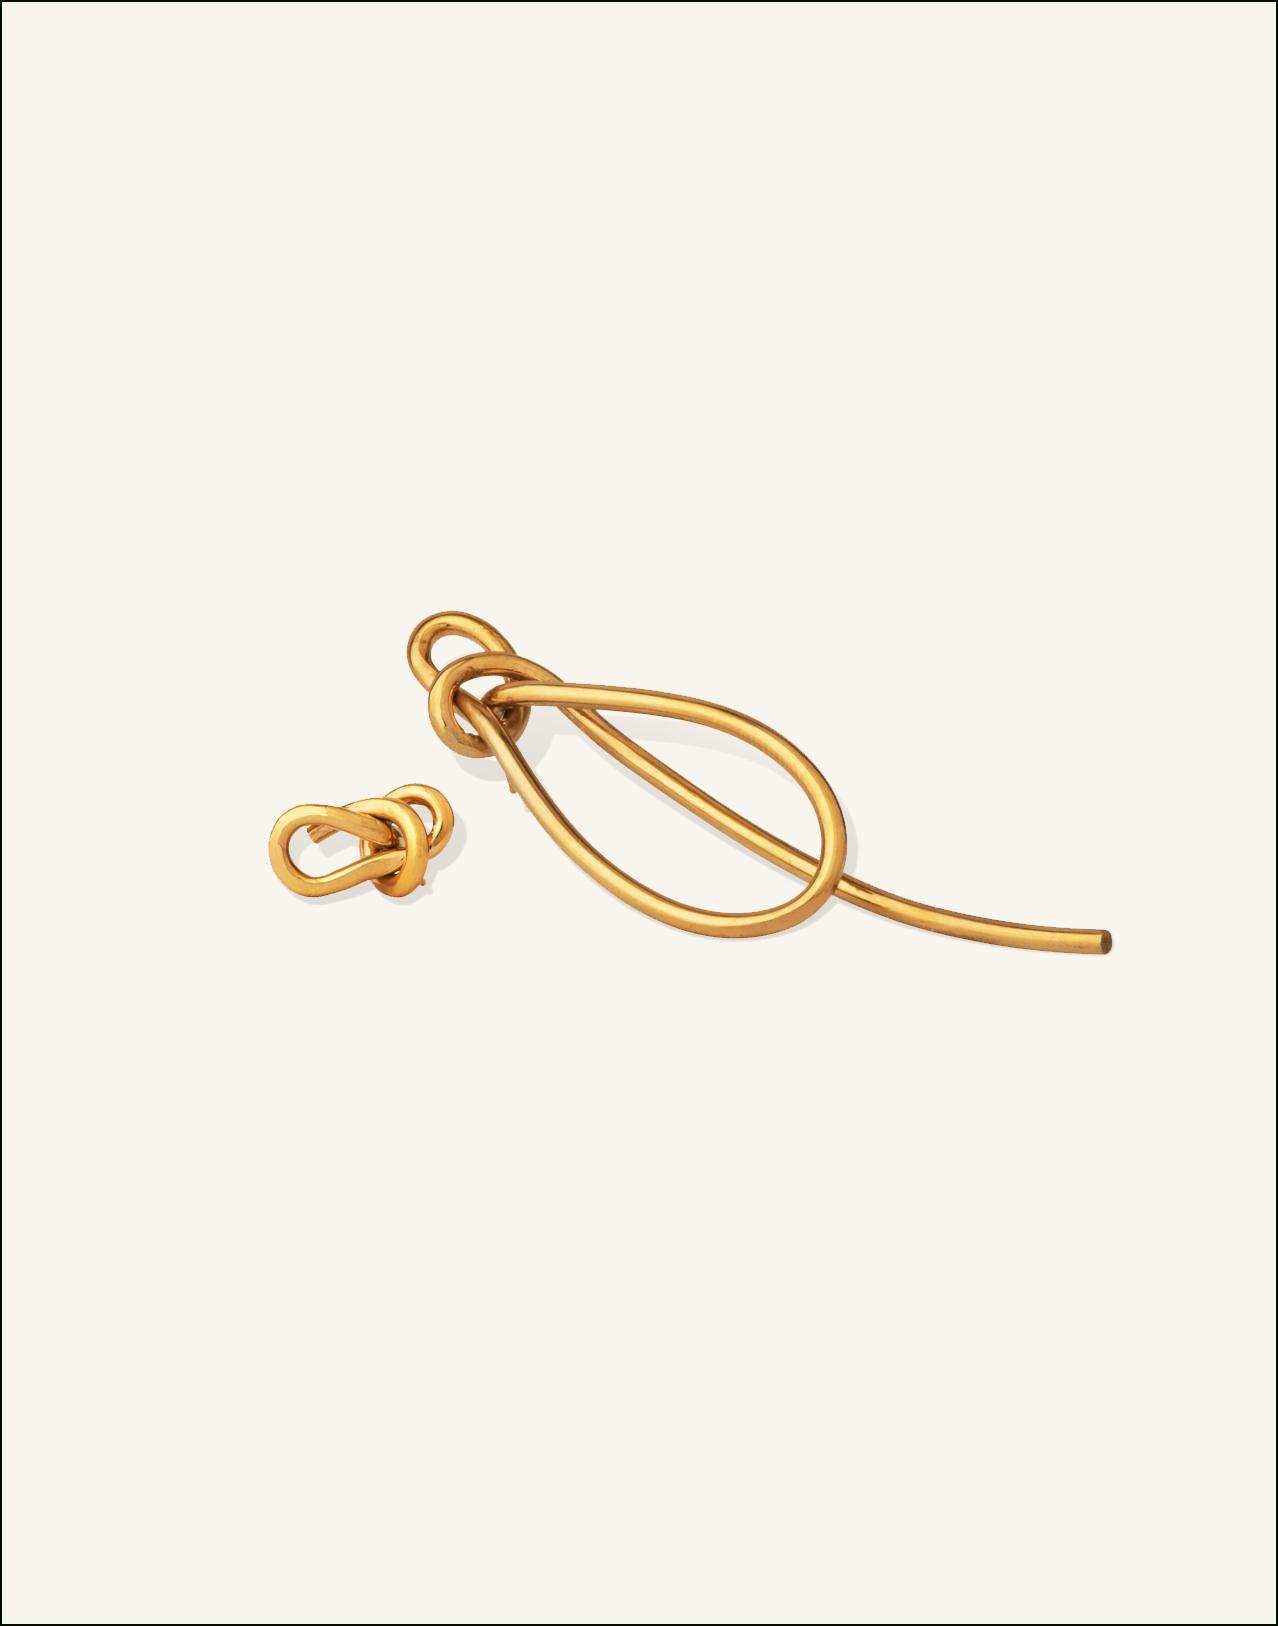 Completedworks-Earrings-The-Bird-3-1.jpg